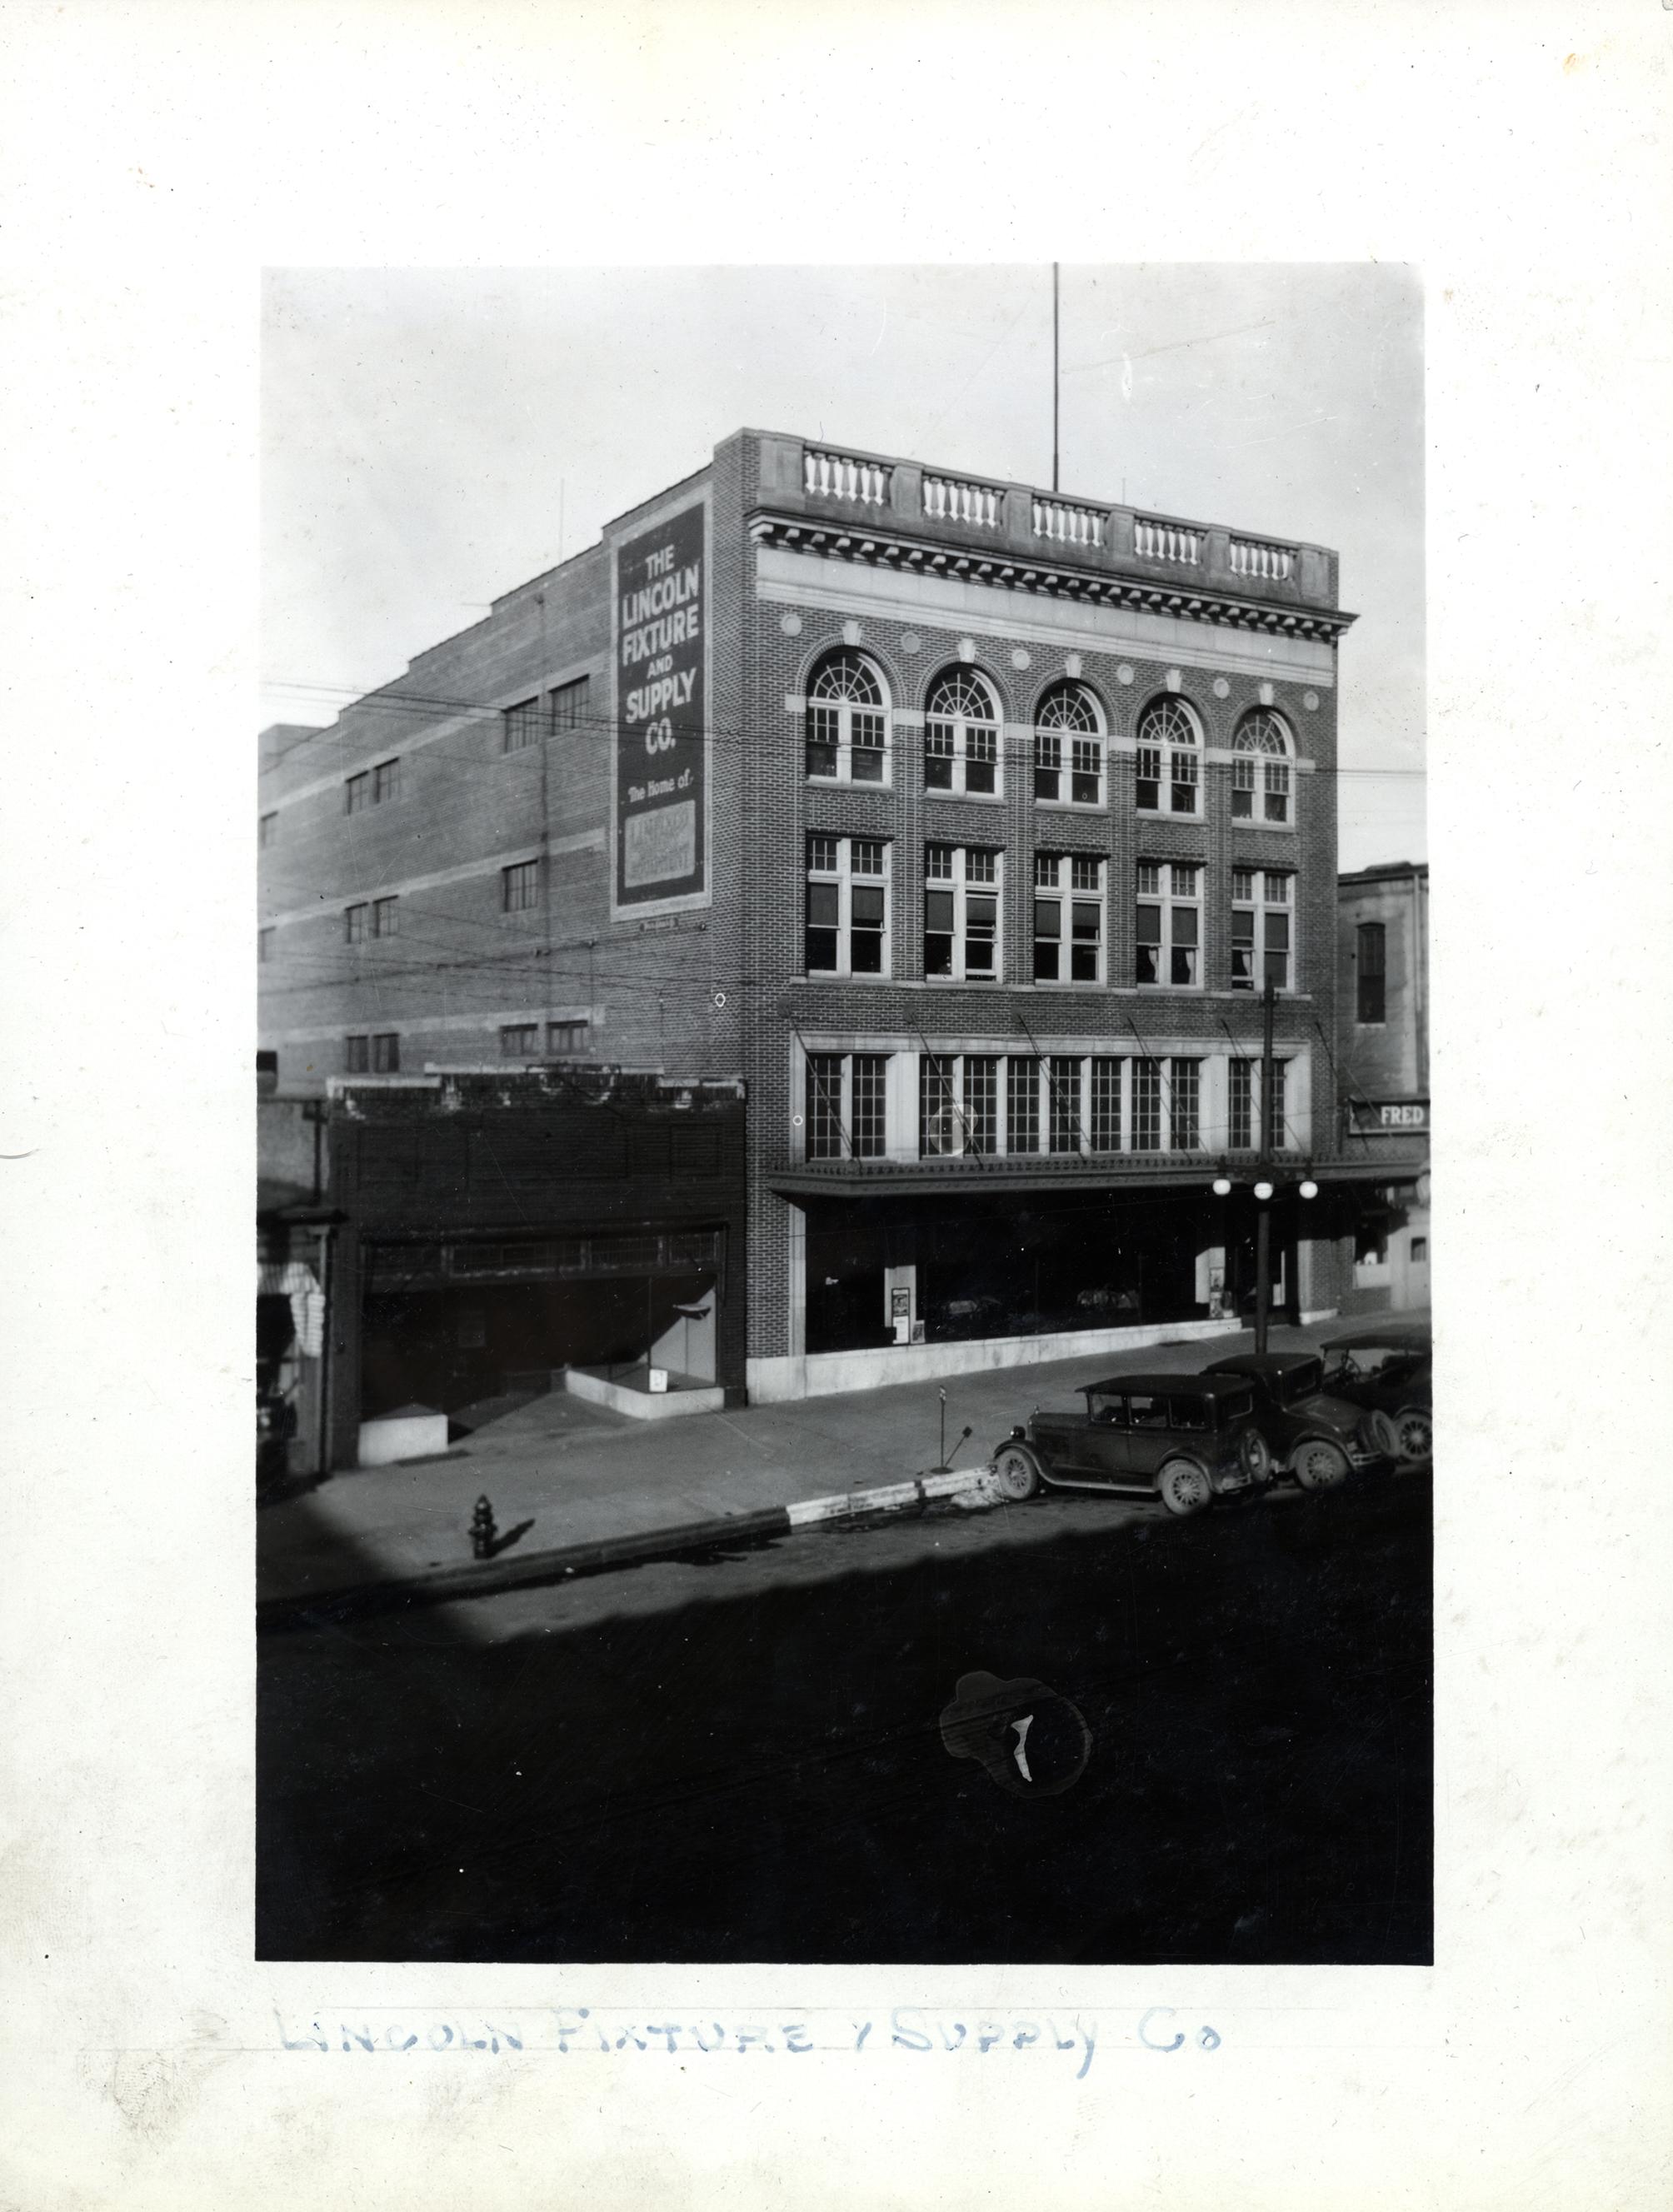 31. Lincoln Fixture Building